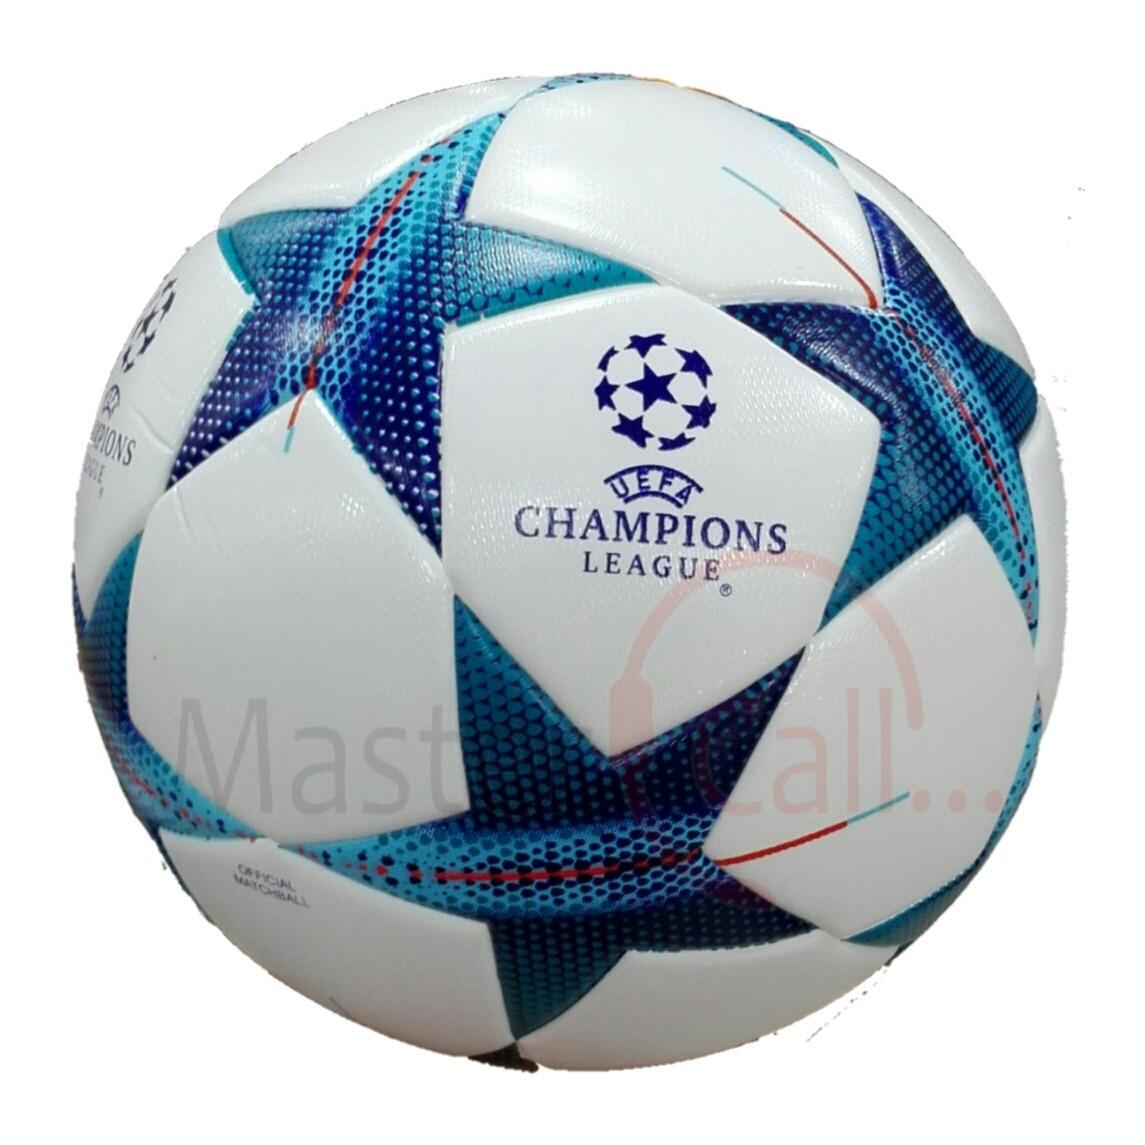 Balon pelota futbol uefa champions league oferta cargando zoom jpg  1145x1145 Pelota de futbol la champions 205a0ab425cf3